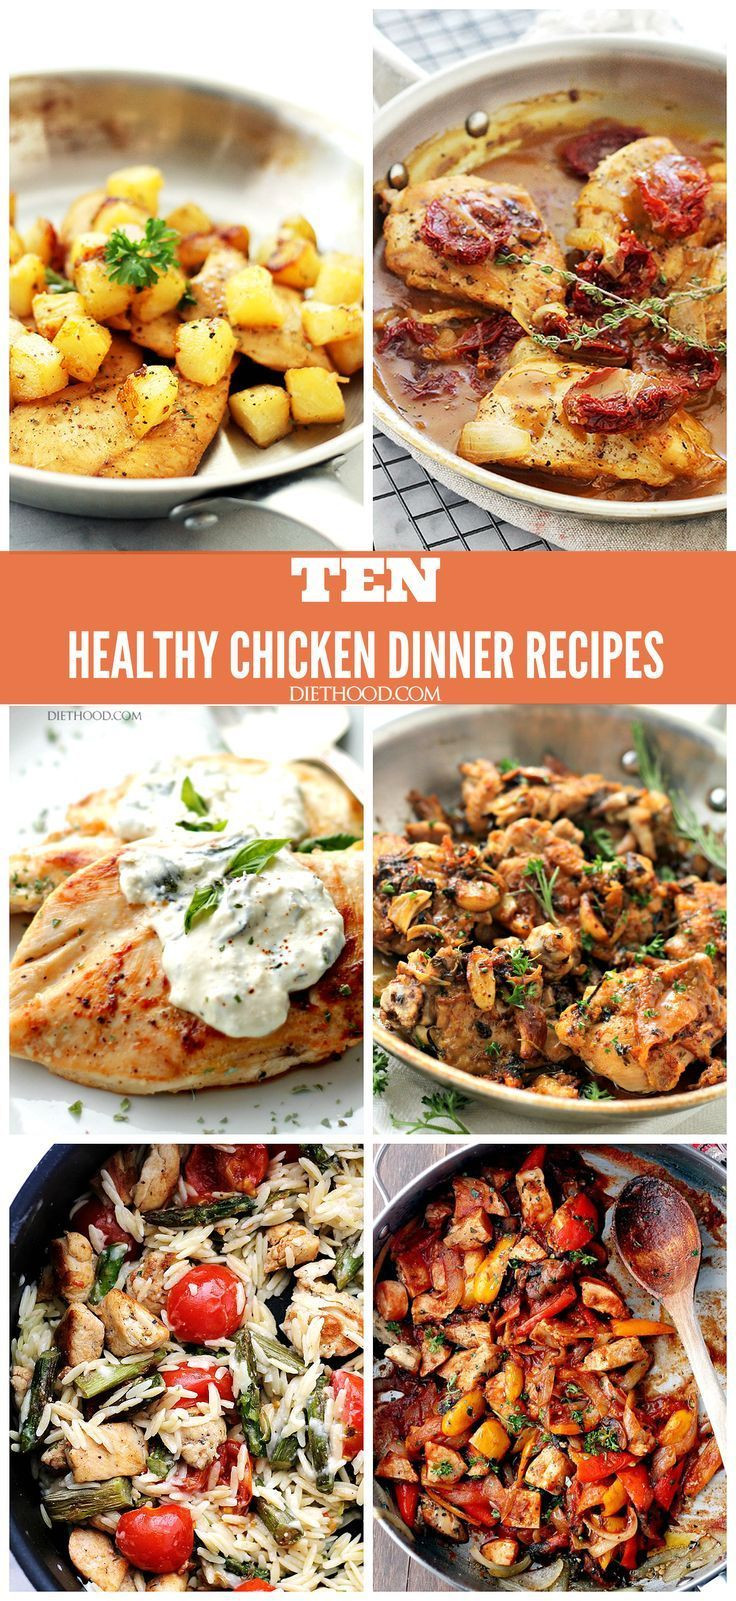 Healthy Chicken Dinners  TEN HEALTHY CHICKEN DINNER RECIPES A pilation of my